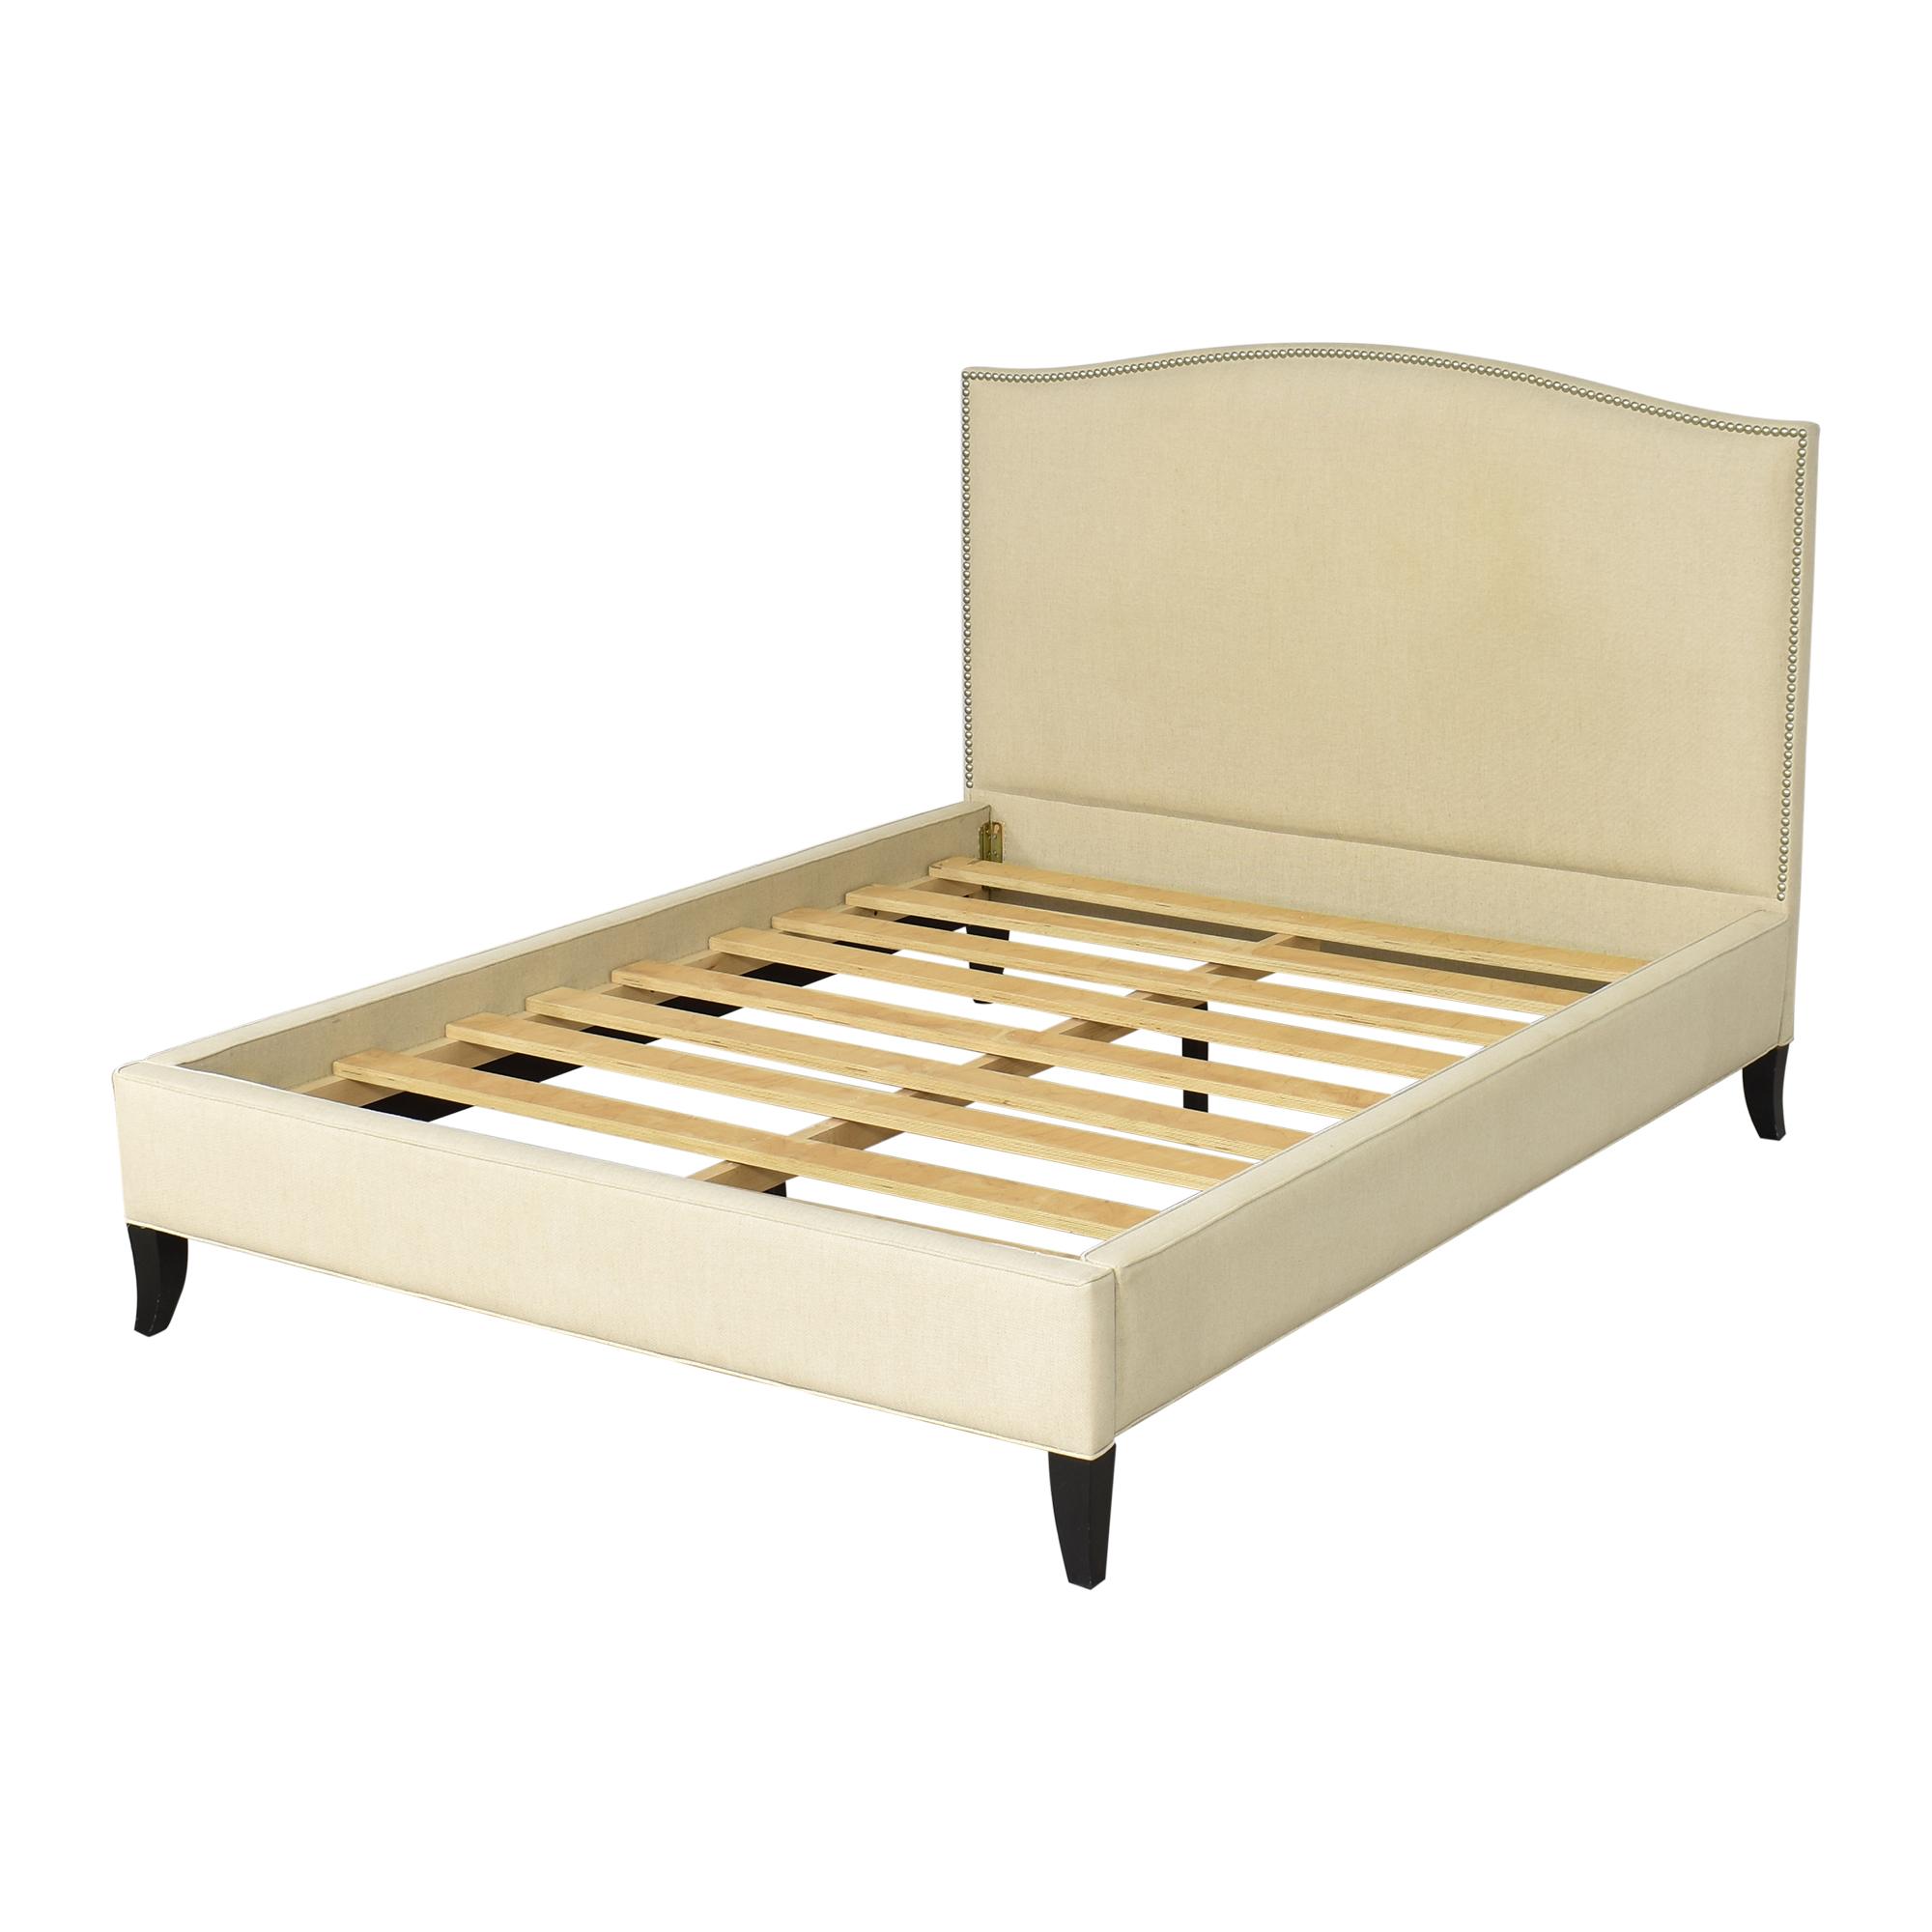 Crate & Barrel Colette Upholstered Queen Bed / Beds